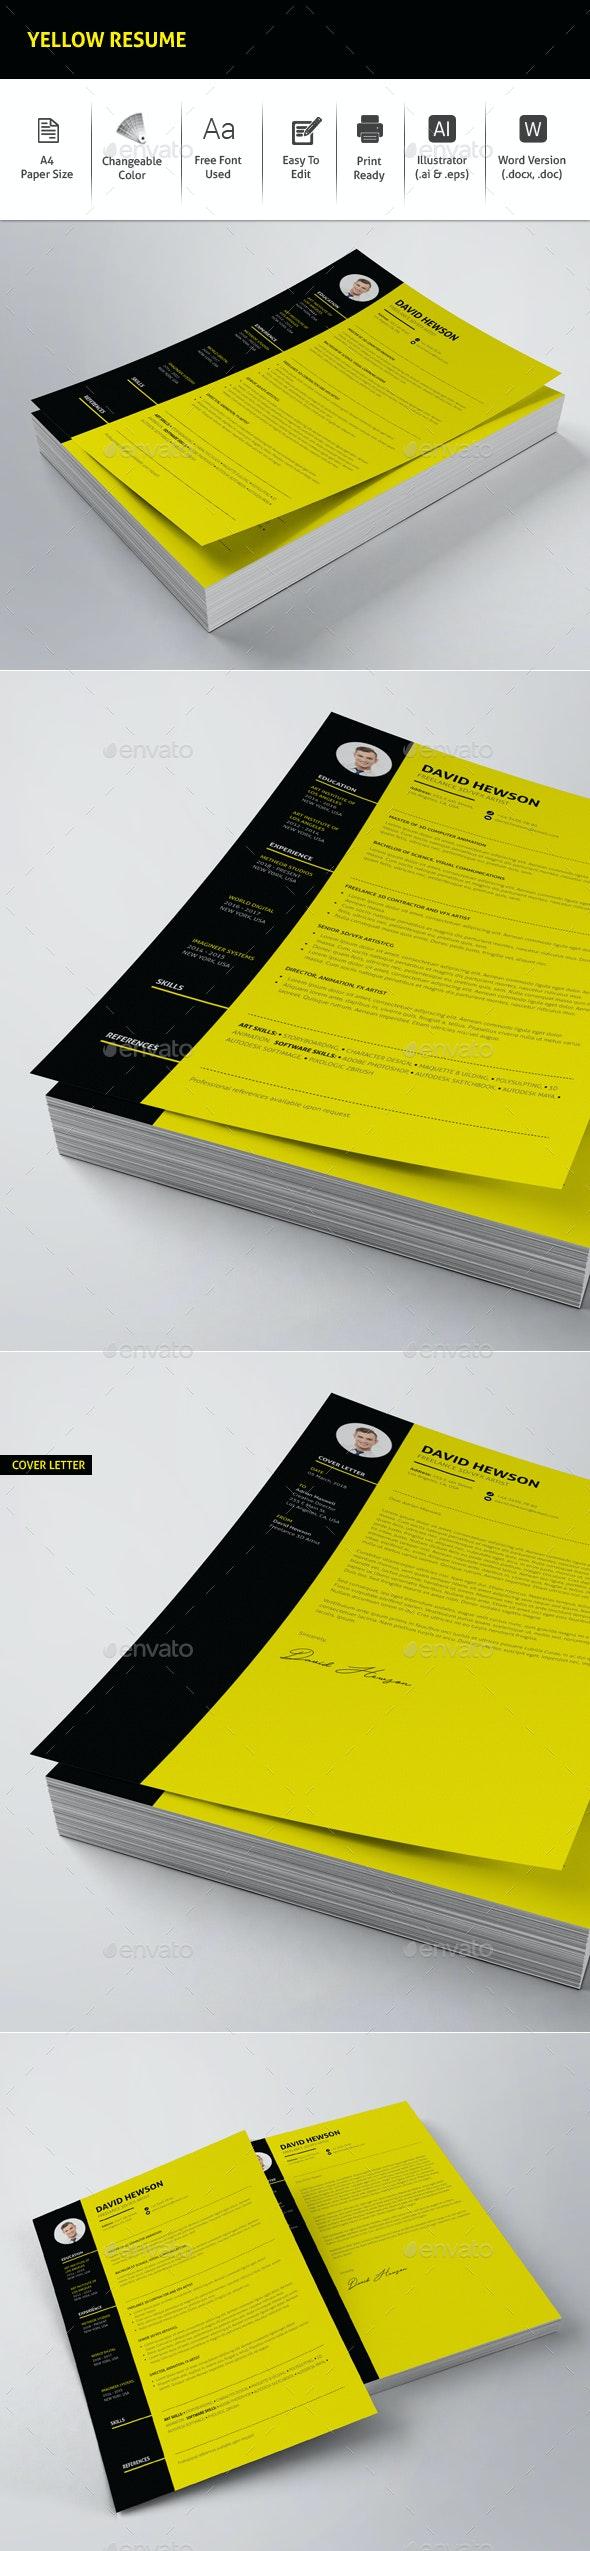 Yellow Resume - Resumes Stationery